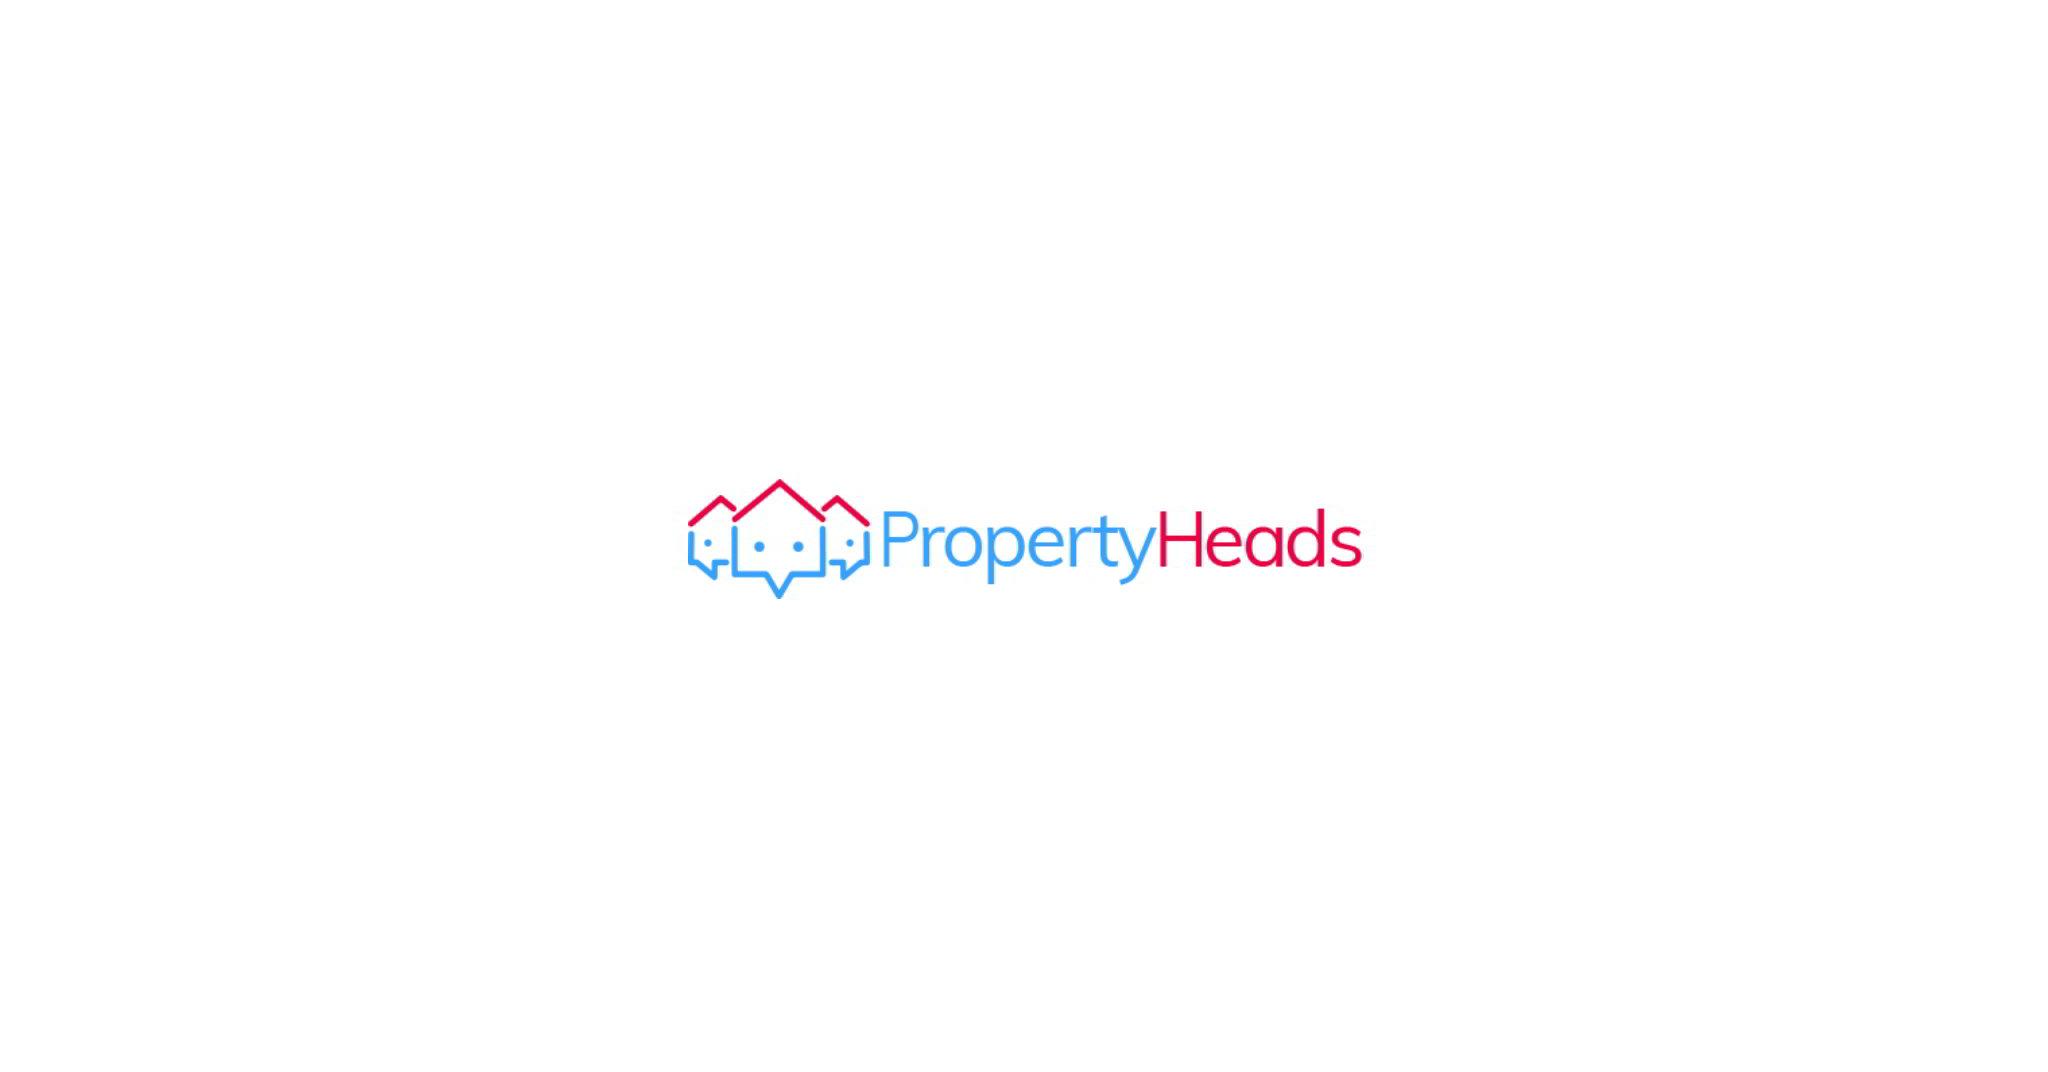 PropertyHeads